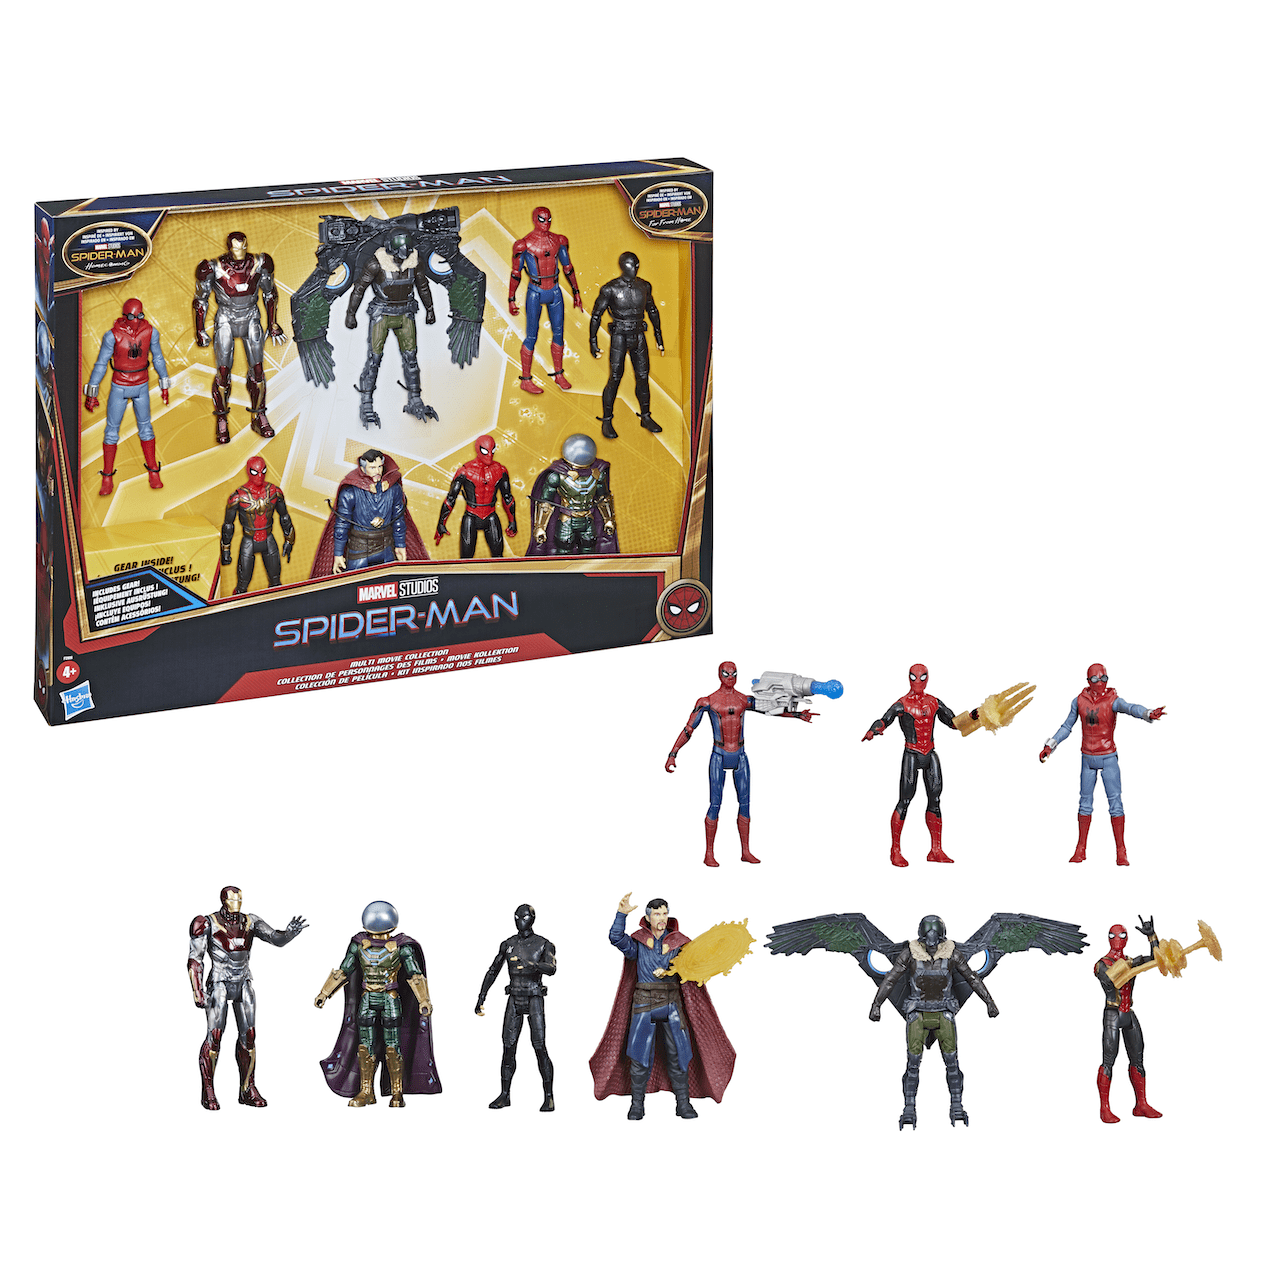 Spider-Man - Multi-Movie Figure Collection